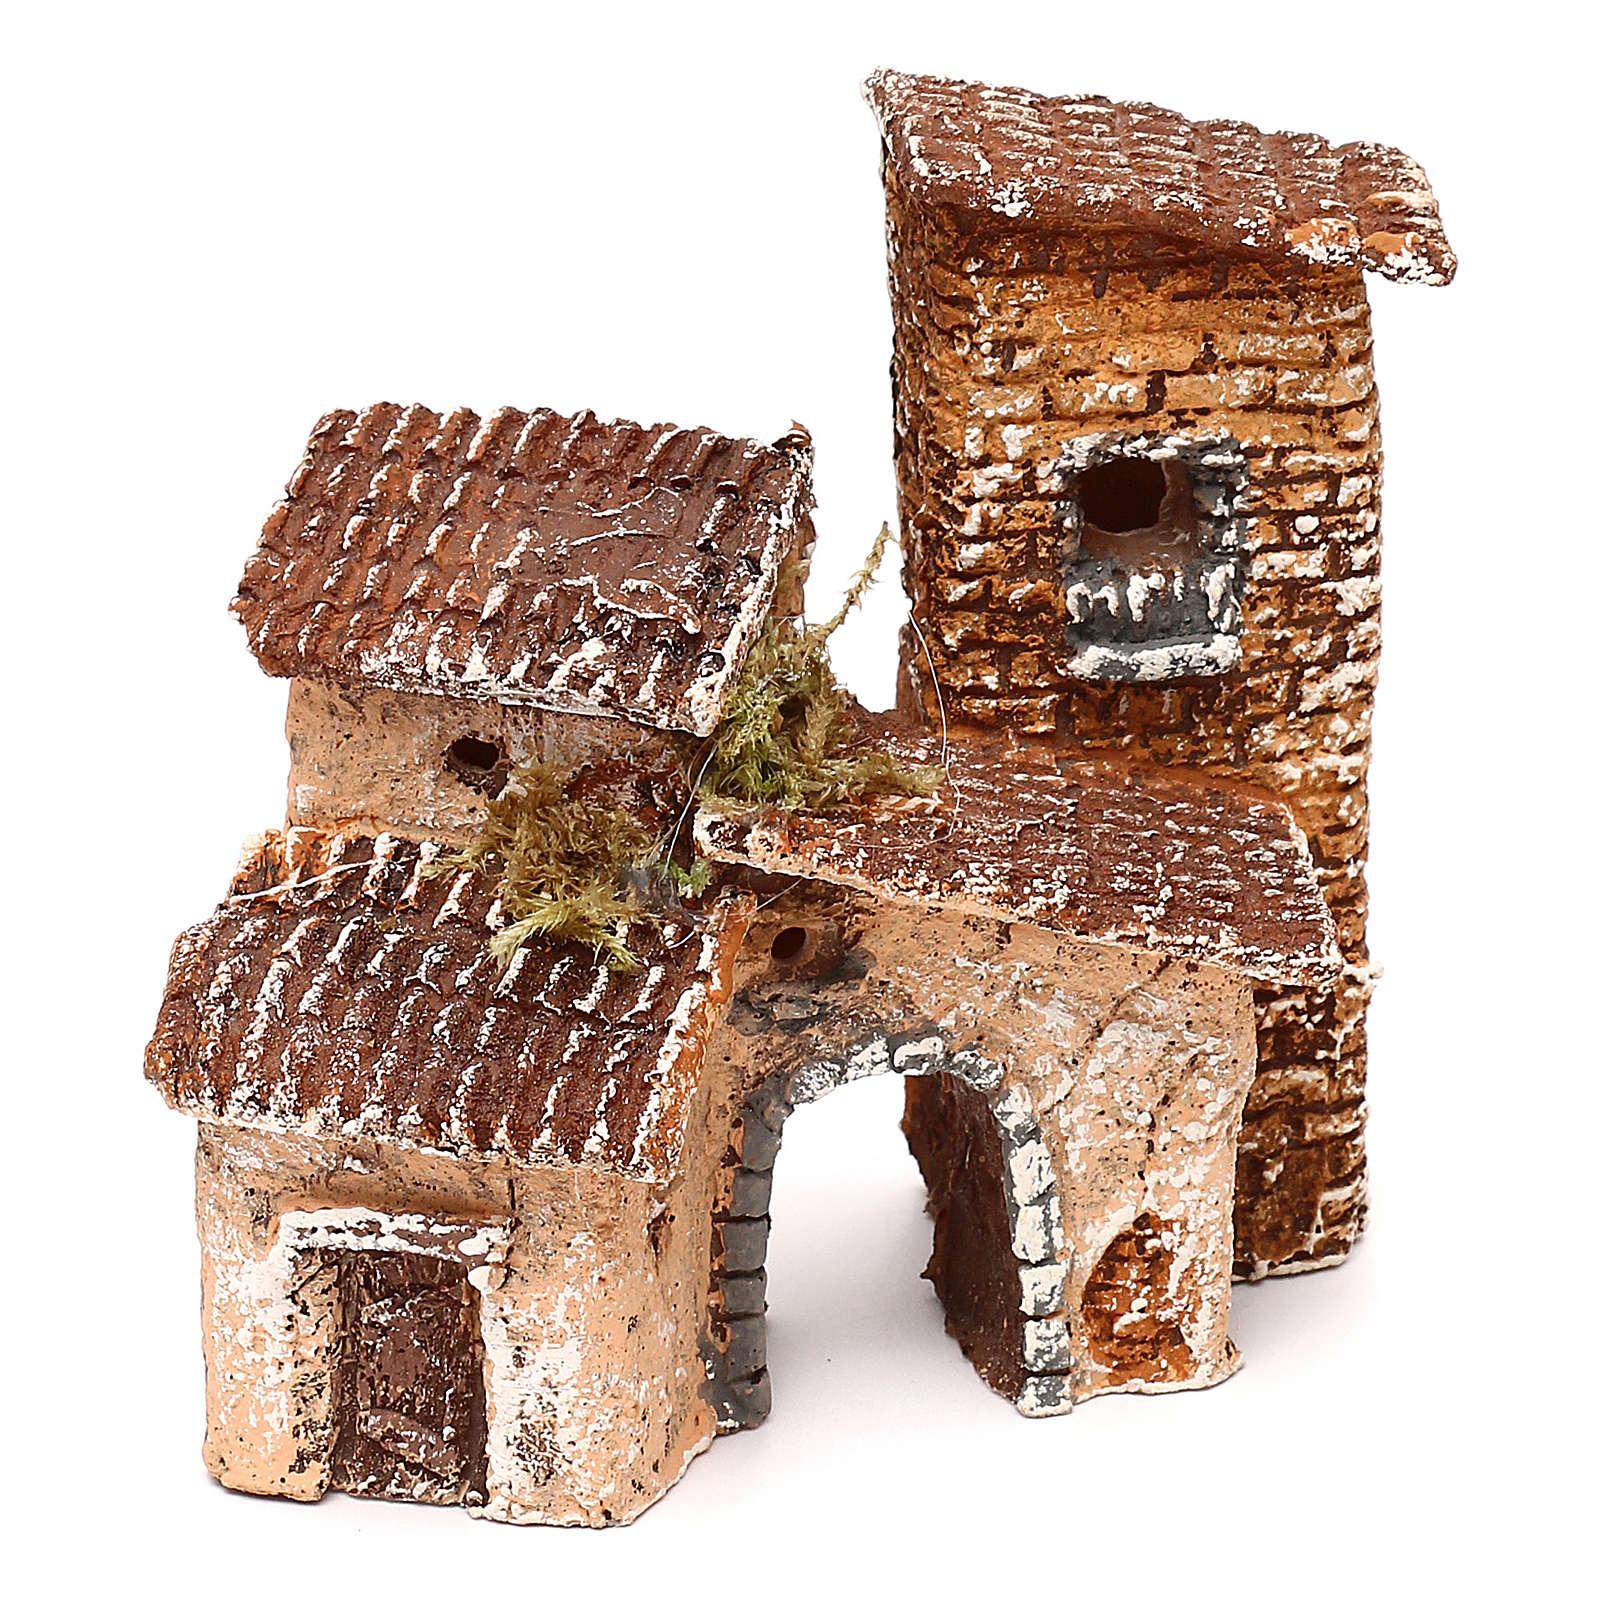 Borgo con arcata 10x10x10 cm presepe napoletano 3-4 cm  4